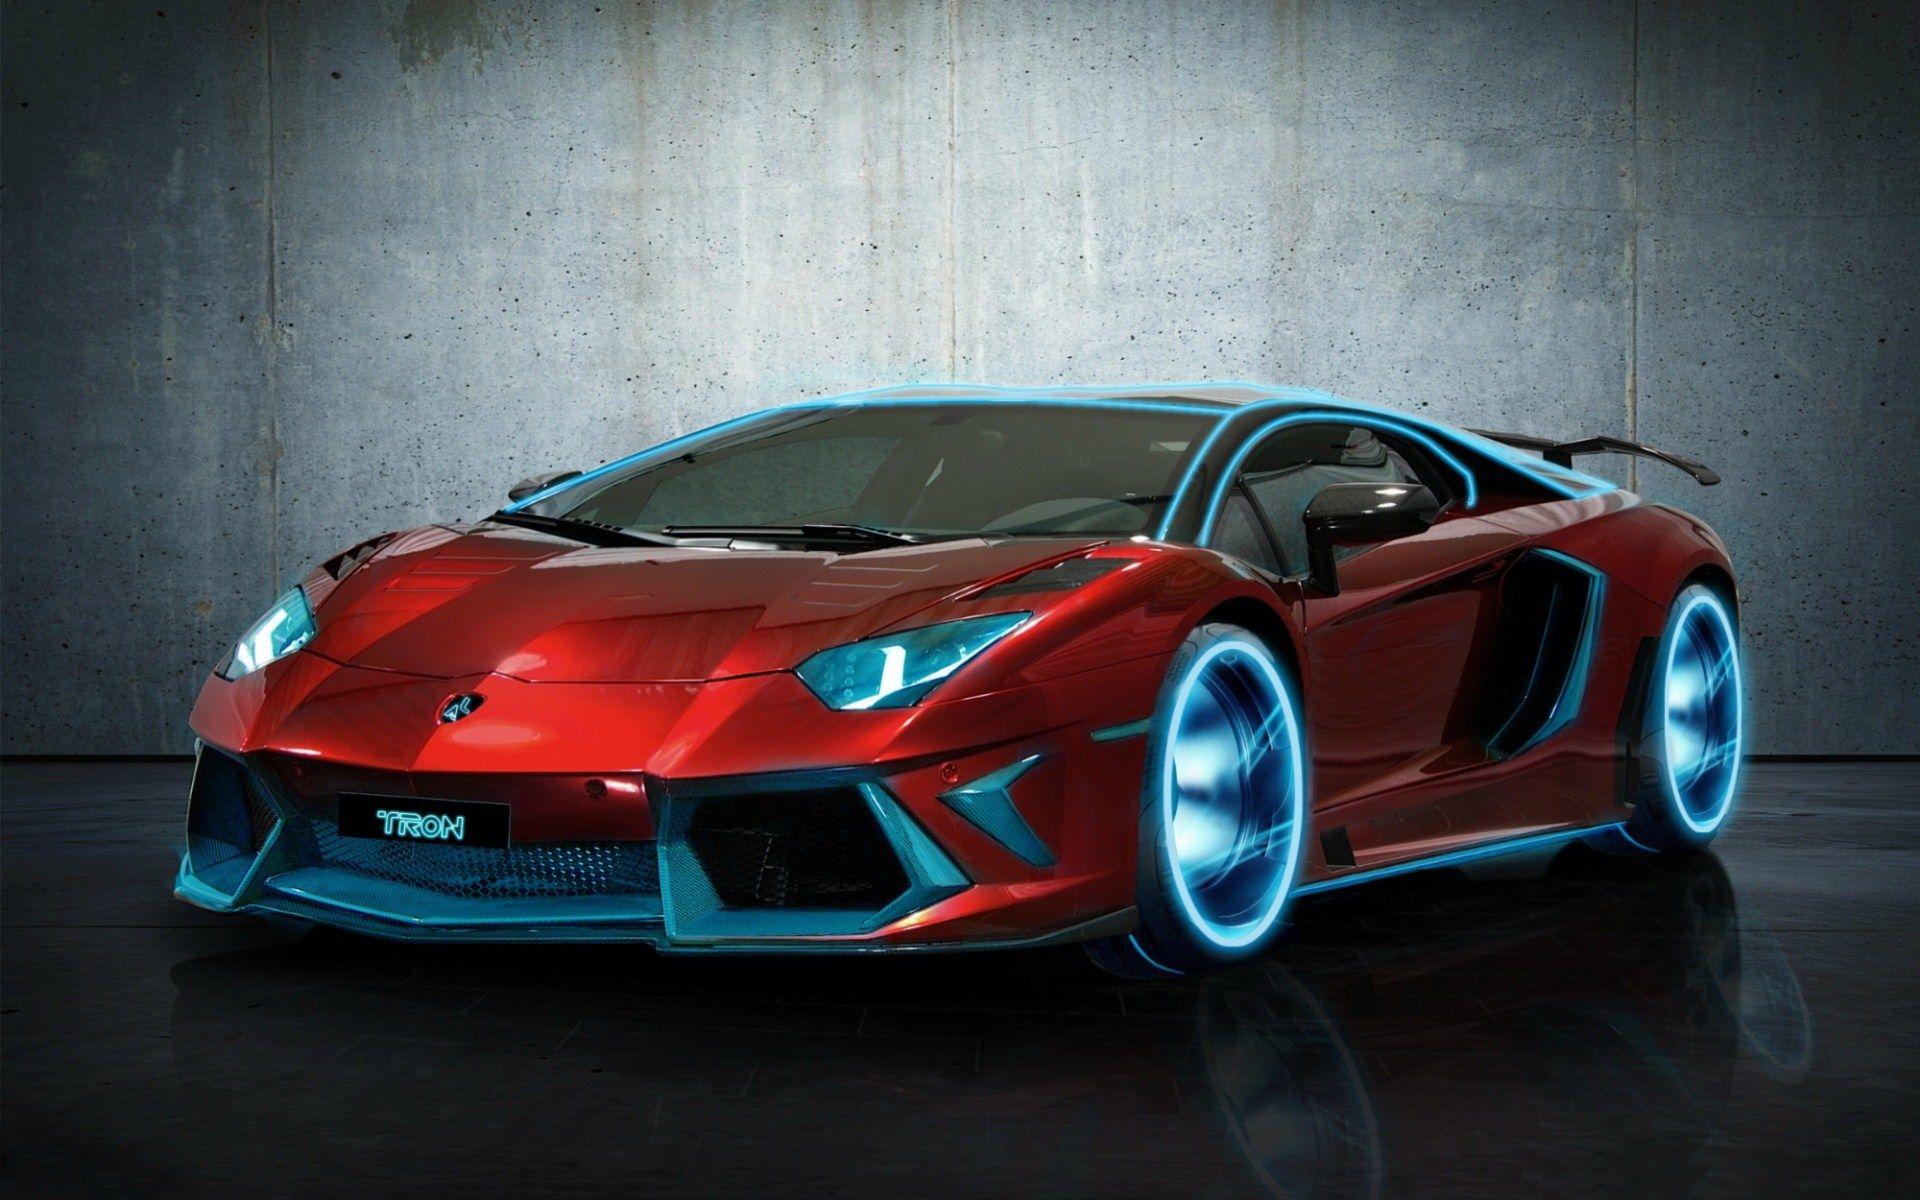 Red Modified Lamborghini | Wallpaper JPEG